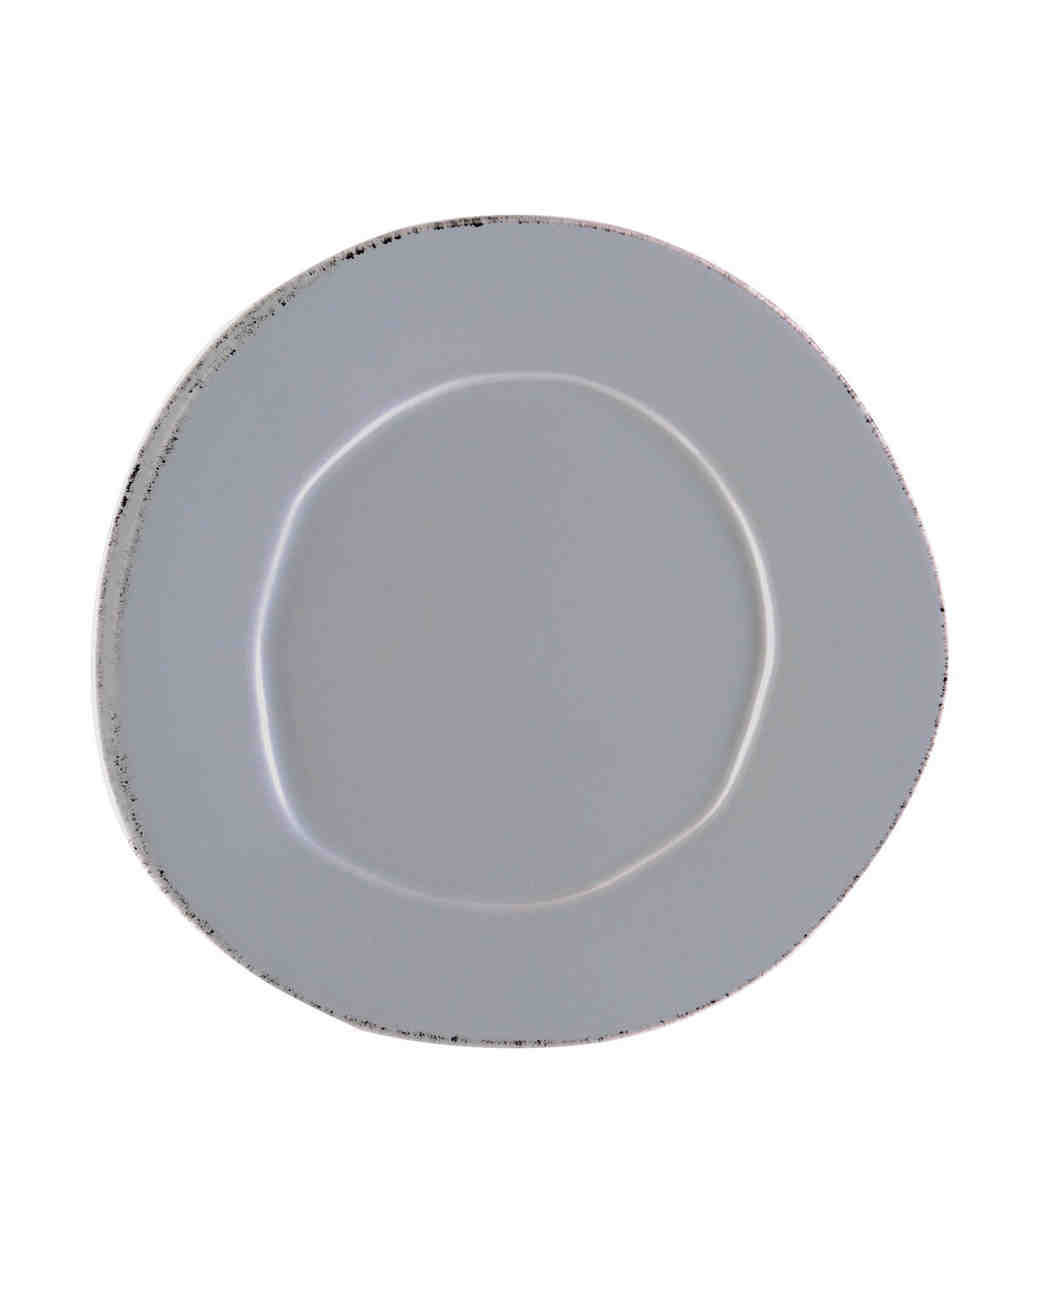 china-registry-essentials-vietri-lastra-dinner-plate-1014.jpg